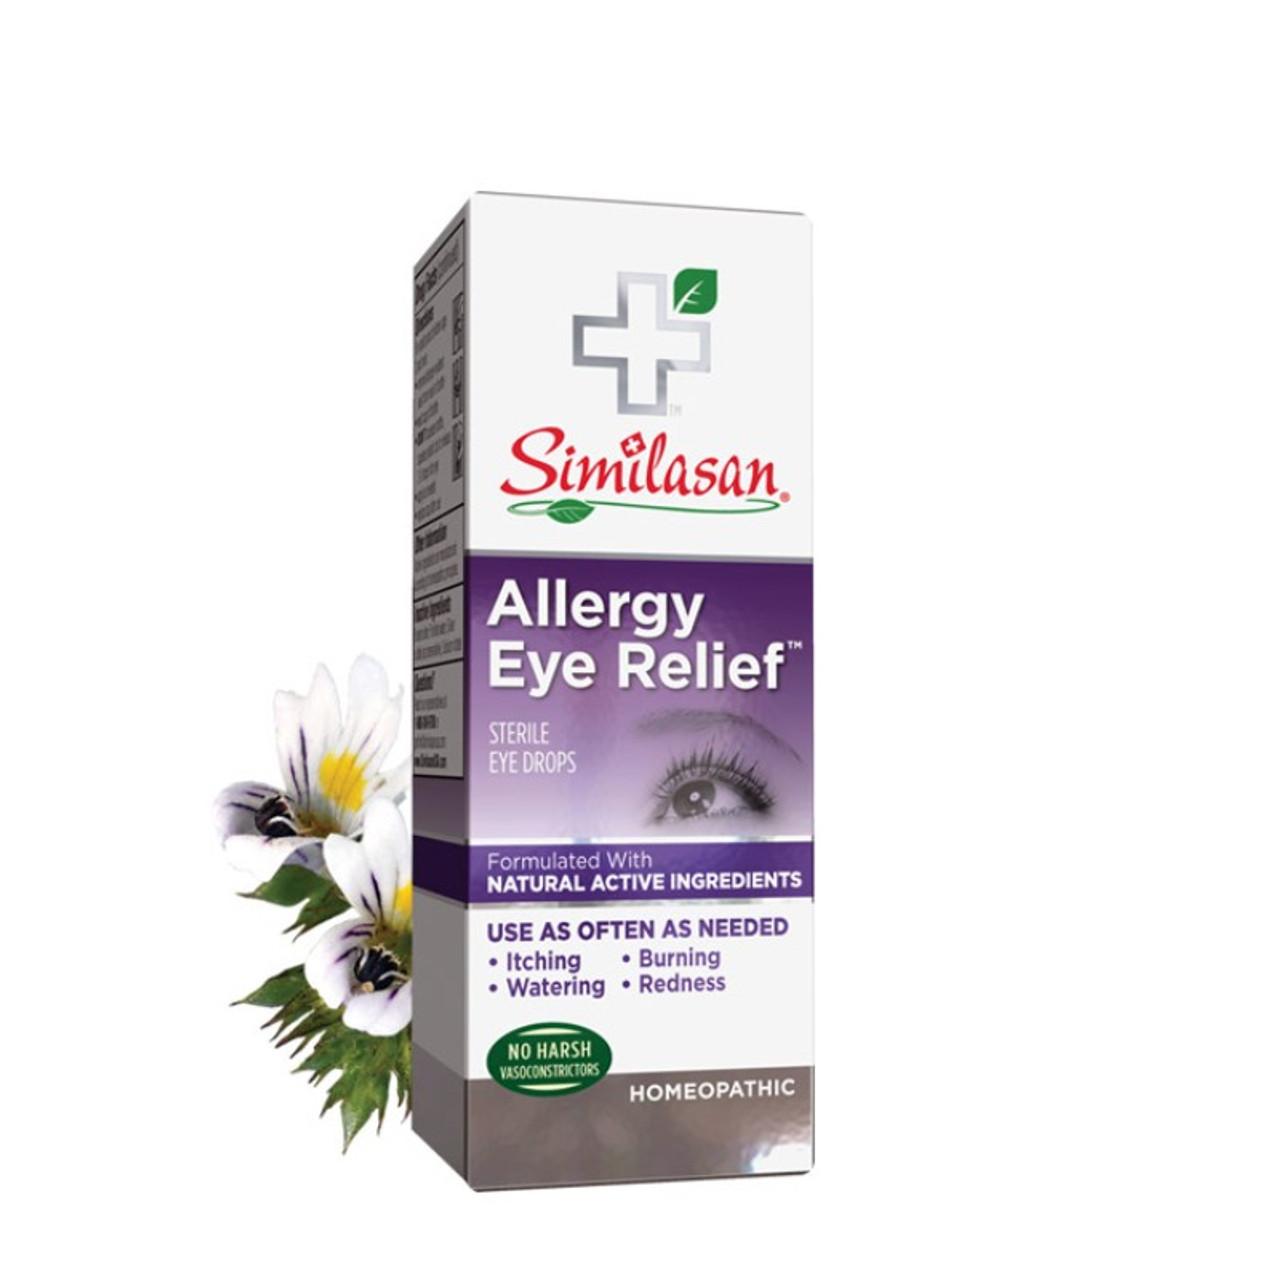 Allergy Eye Relief